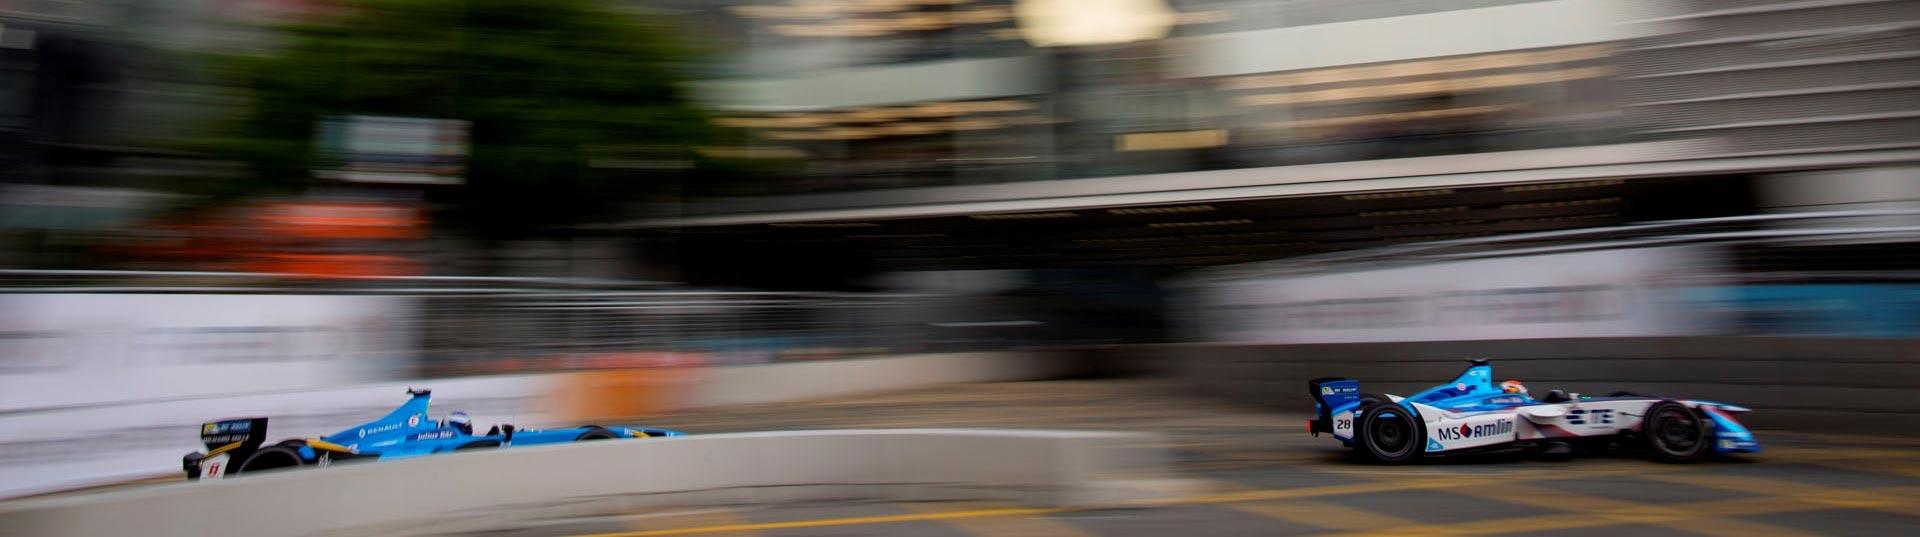 Fórmula E 16/17 arrancou em Hong Kong